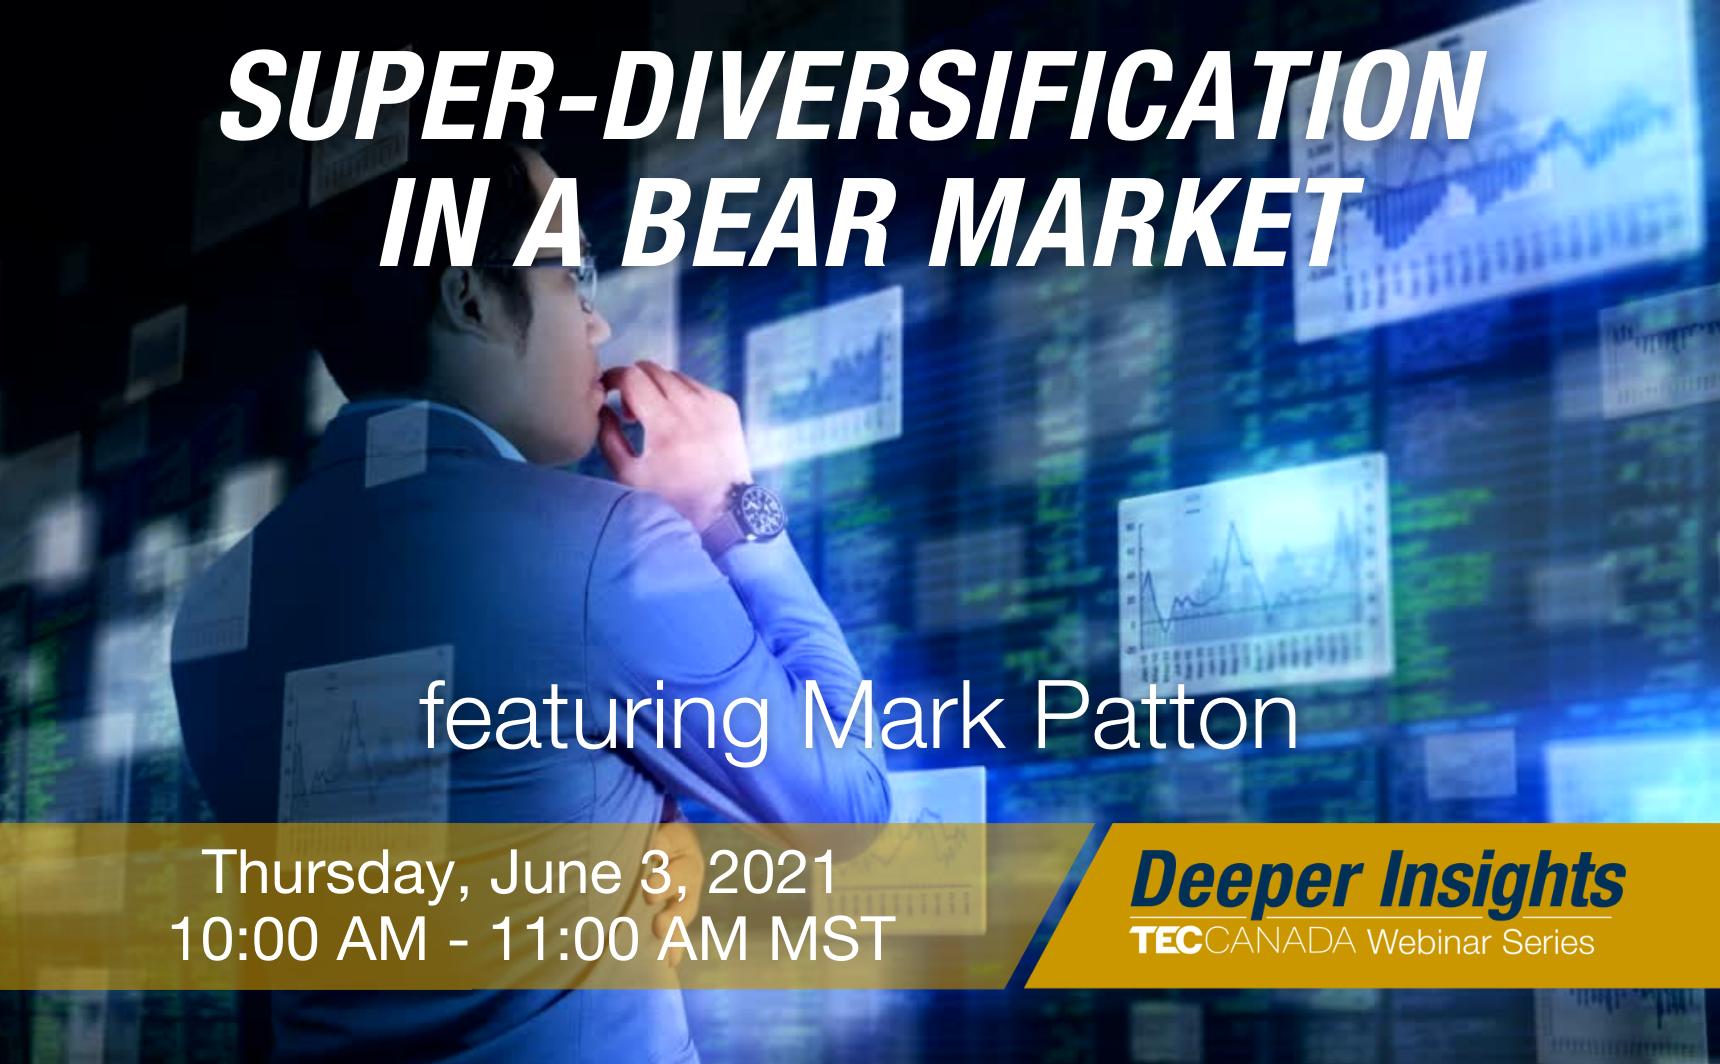 Super-Diversification in a Bear Market: Mark Patton